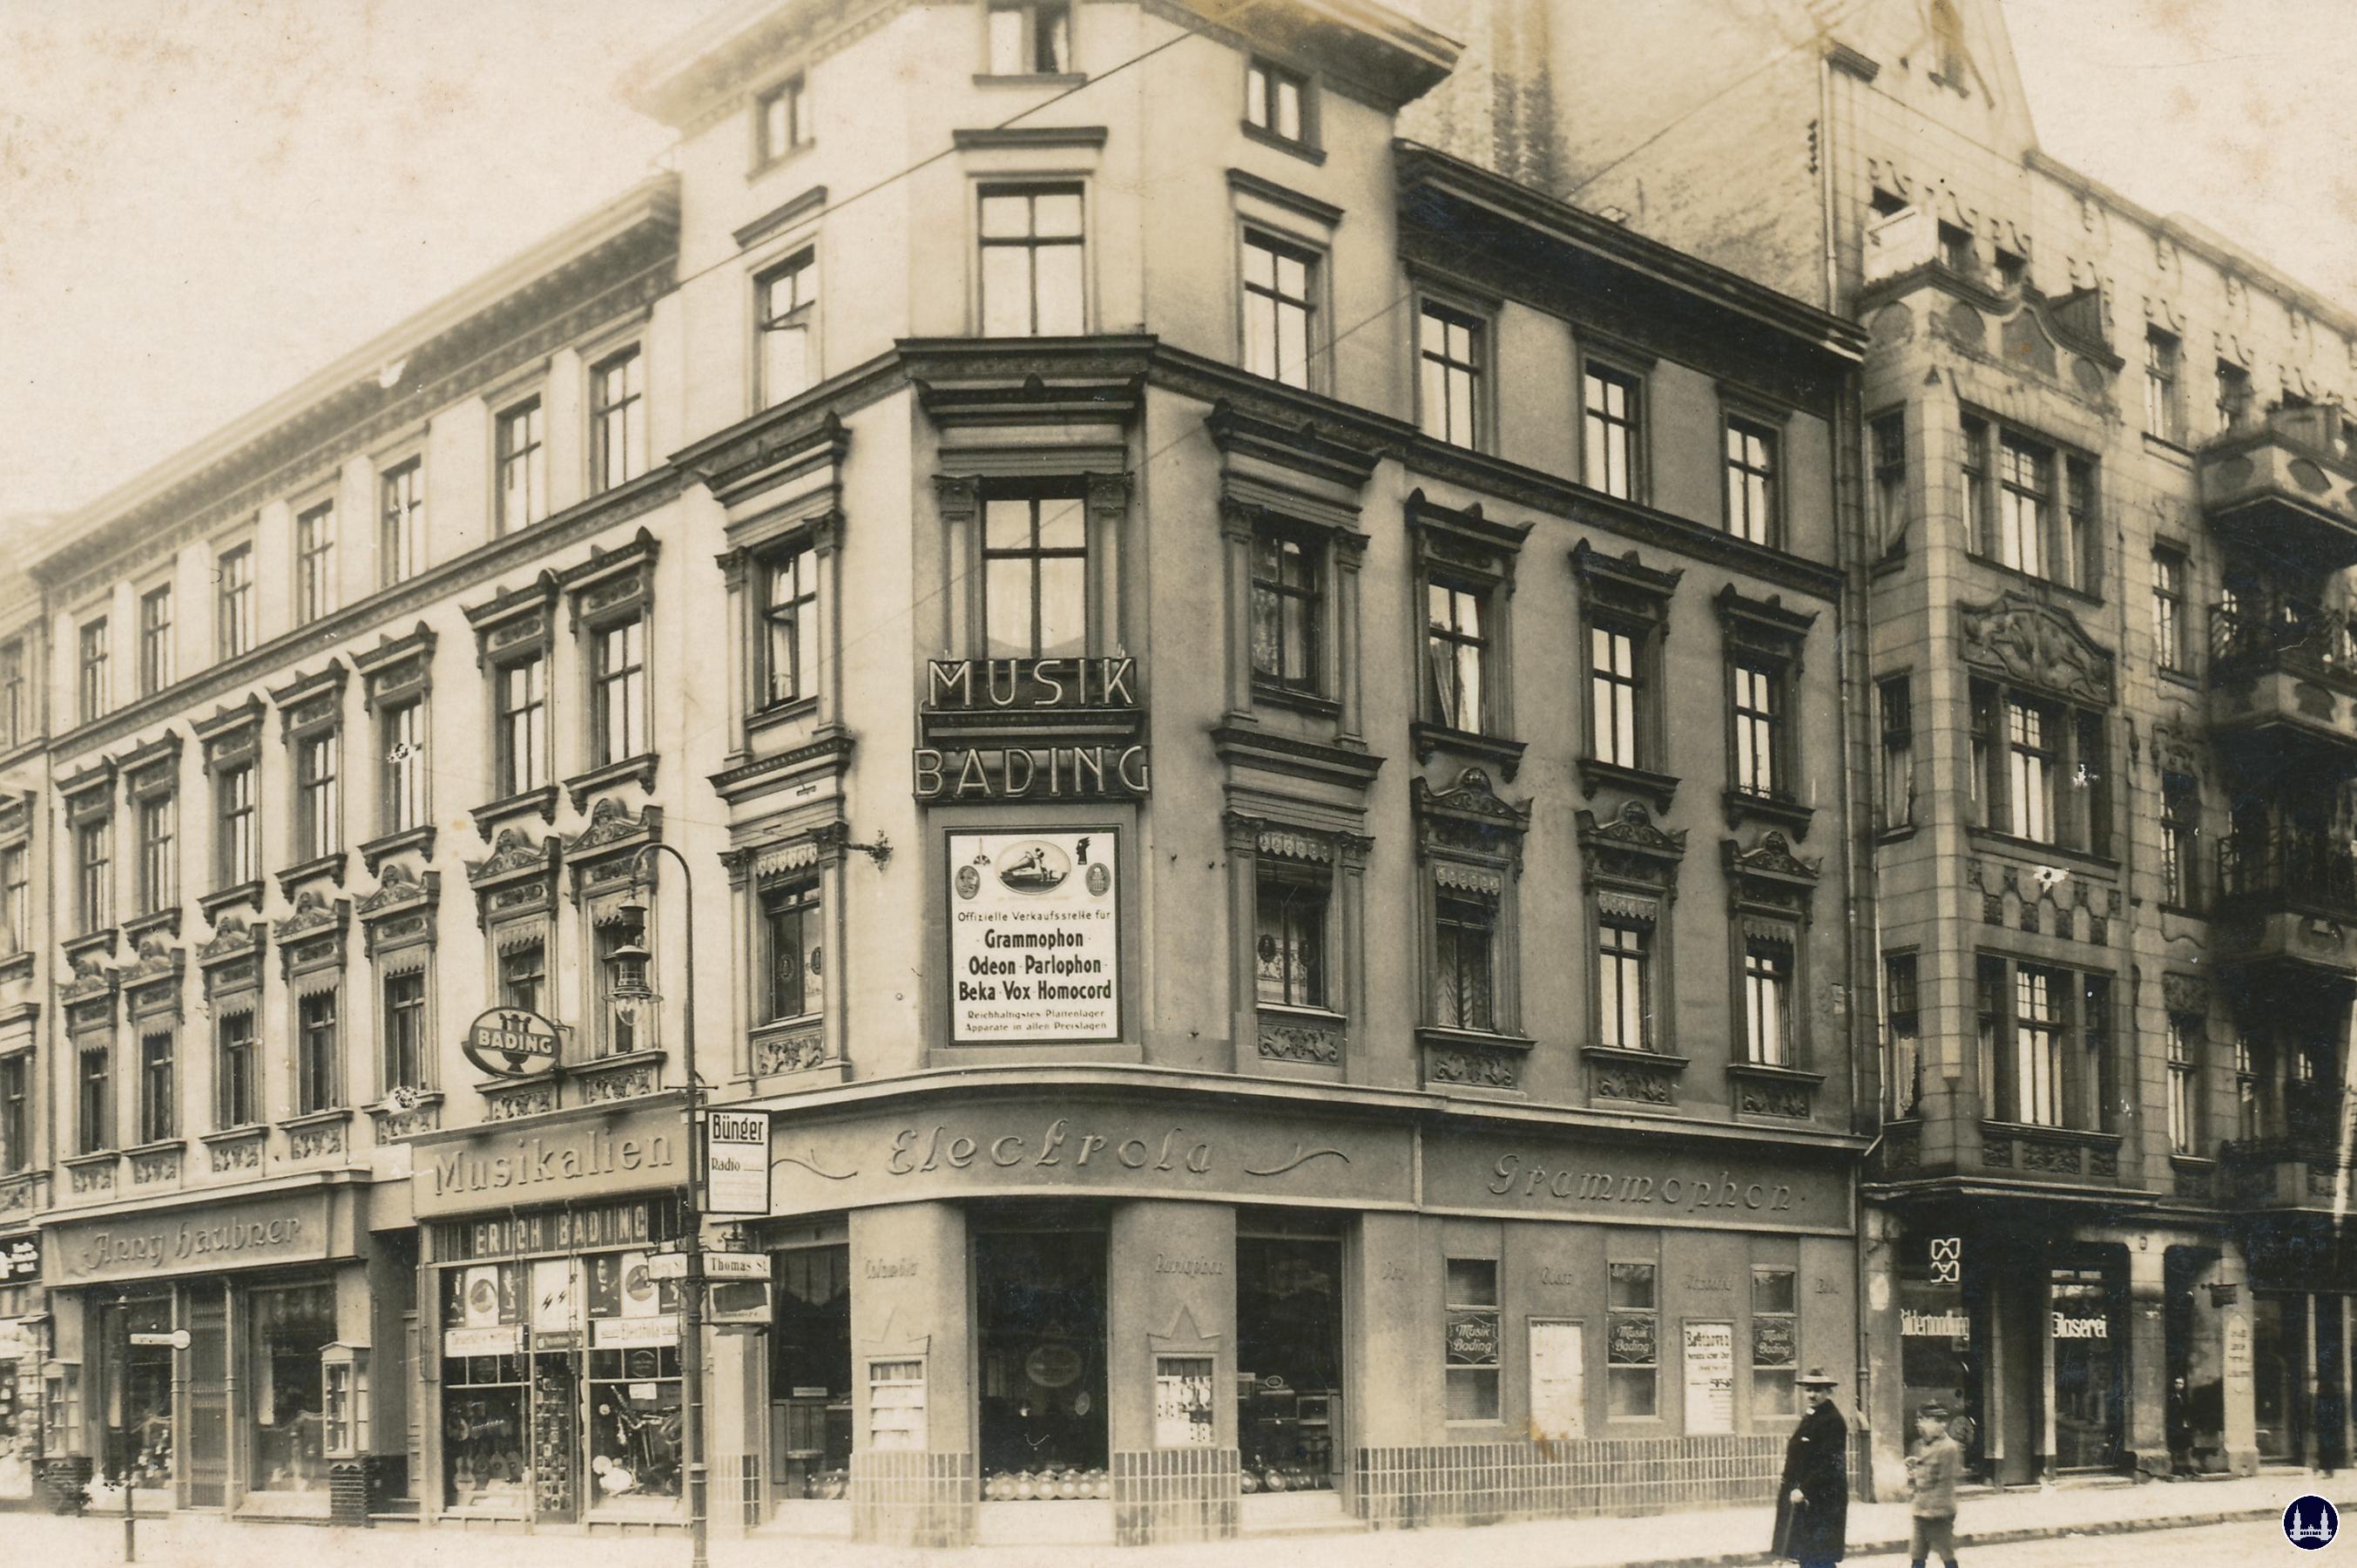 Musikhaus Bading in Berlin - Neukölln, Karl - Marx - Straße. Postkarte von 1919, Sammlung Lutz Röhrig.